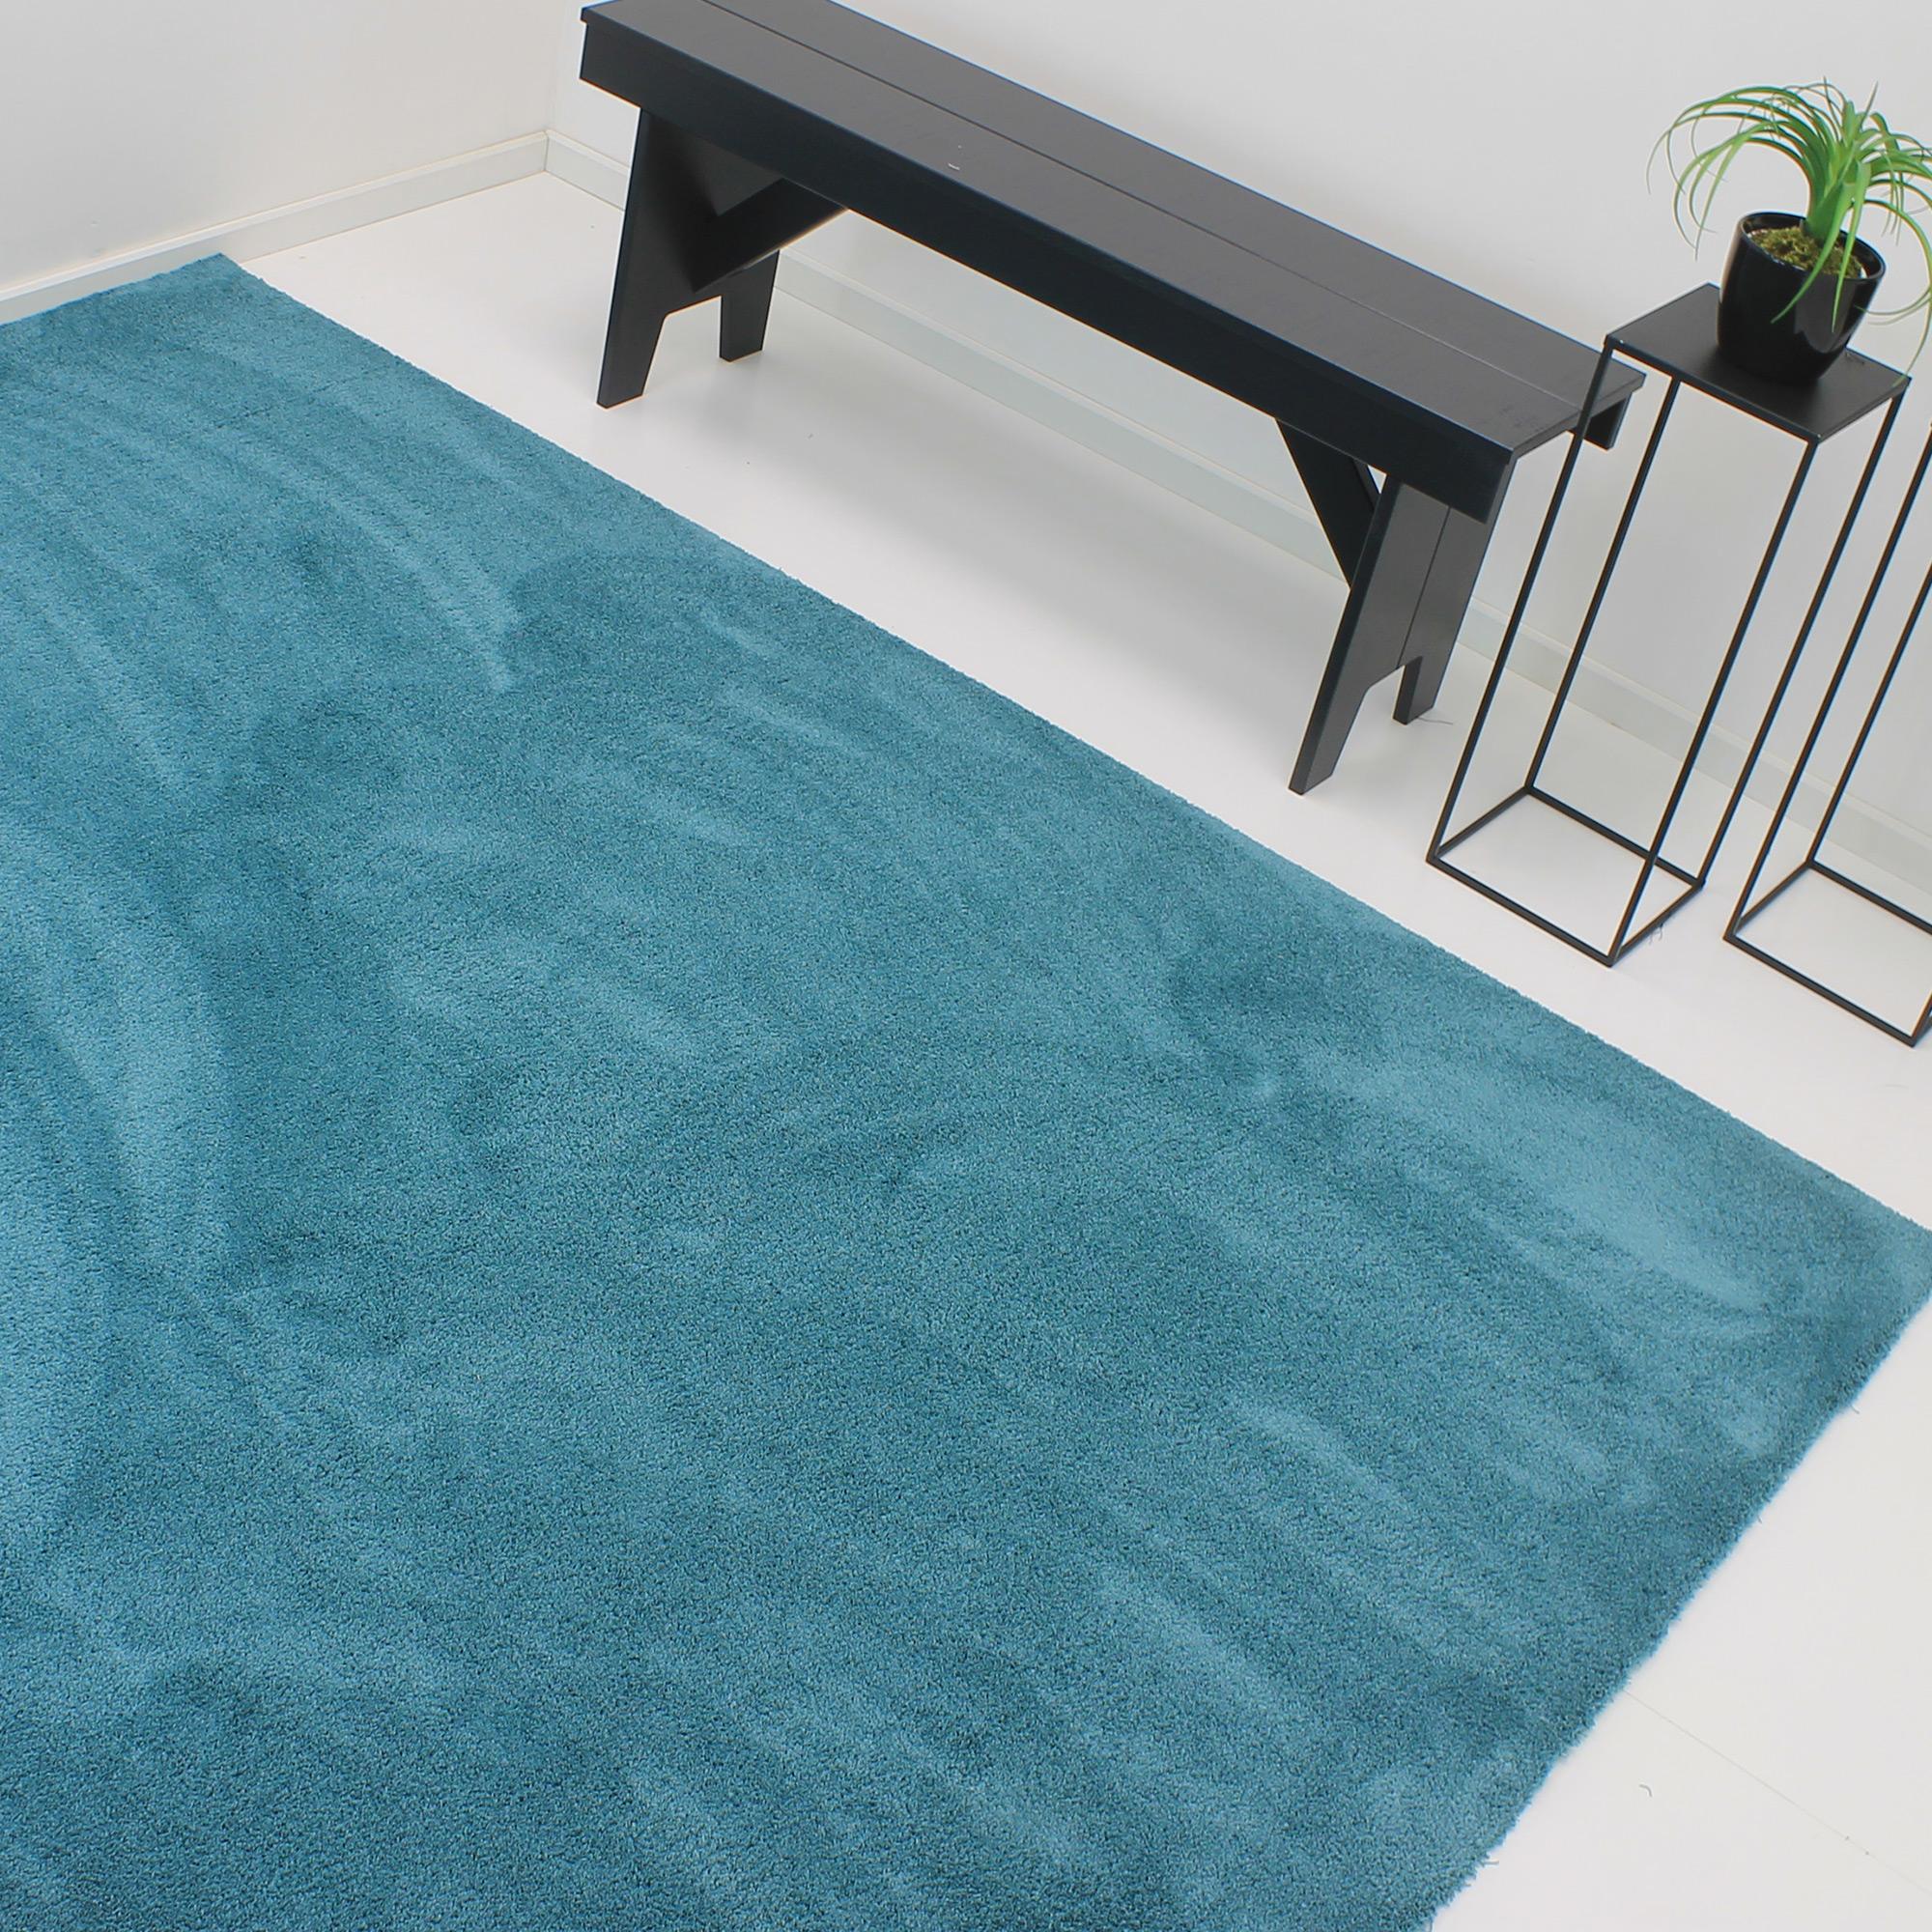 Vloerkleed Xilento Amazing Aqua | 170 x 230 cm